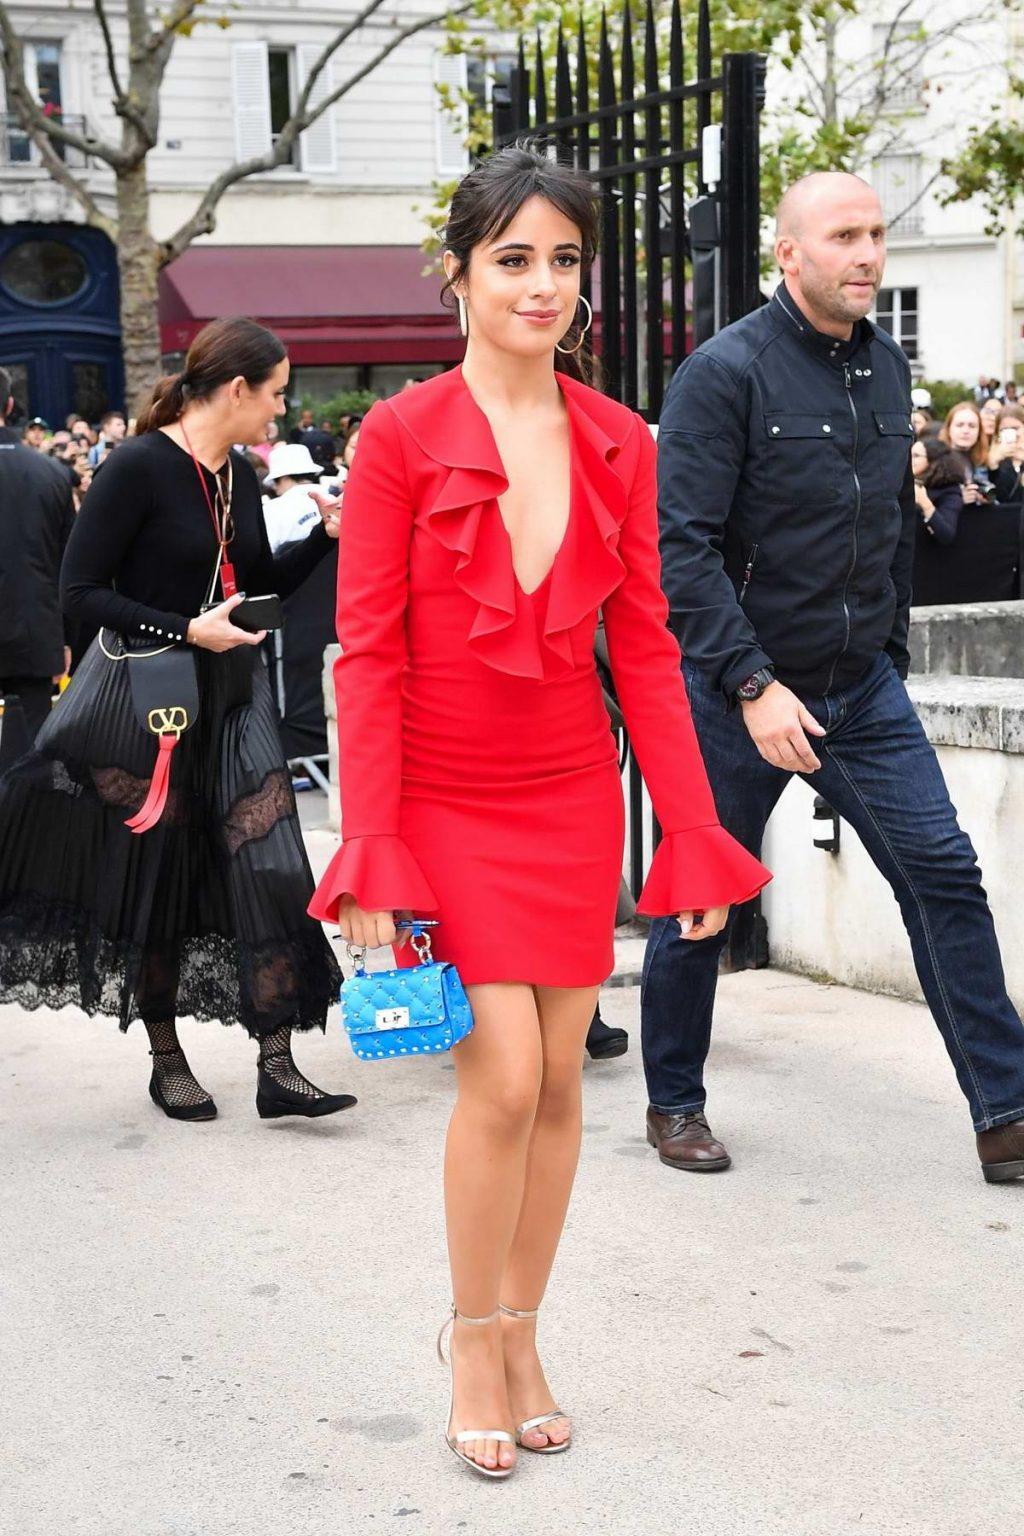 Camila Cabello tại show Valentino Xuân - Hè 2020 - tuần lễ thời trang Paris